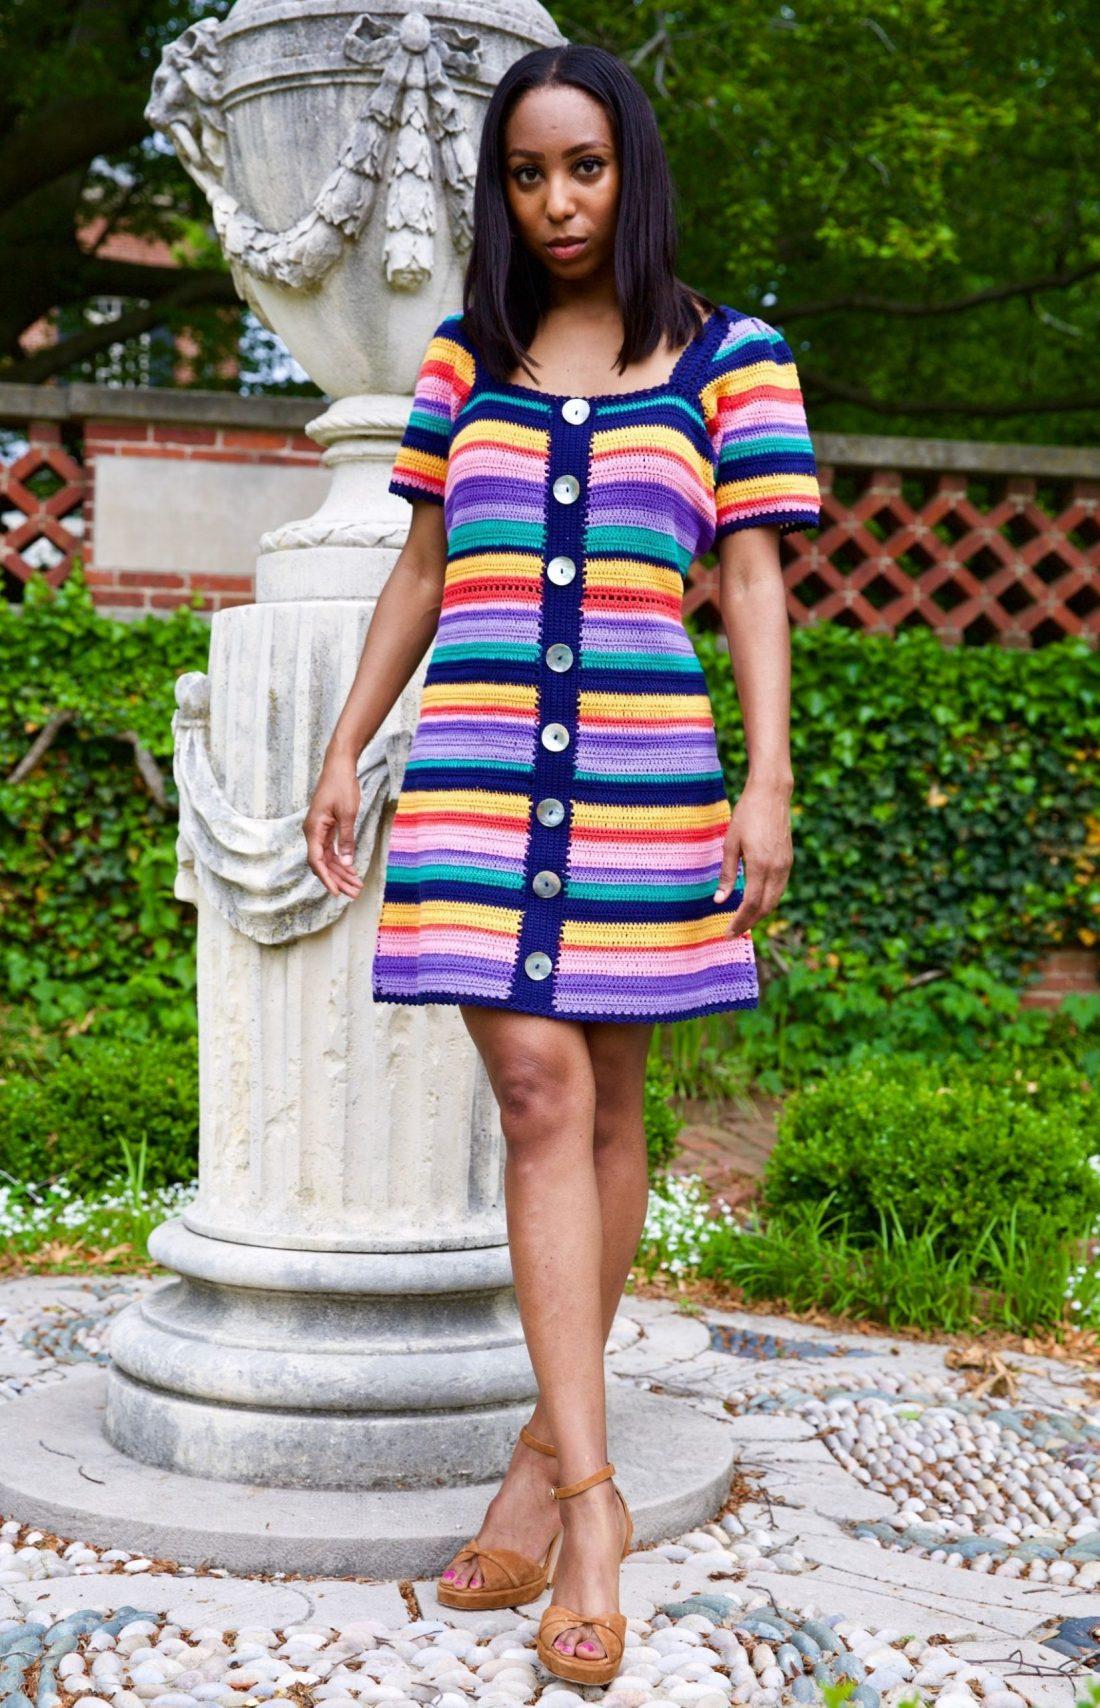 Jilene Jackson stand posing against stone statue in garden patio wearing Farm Rio Rainbow Crochet Mini Dress